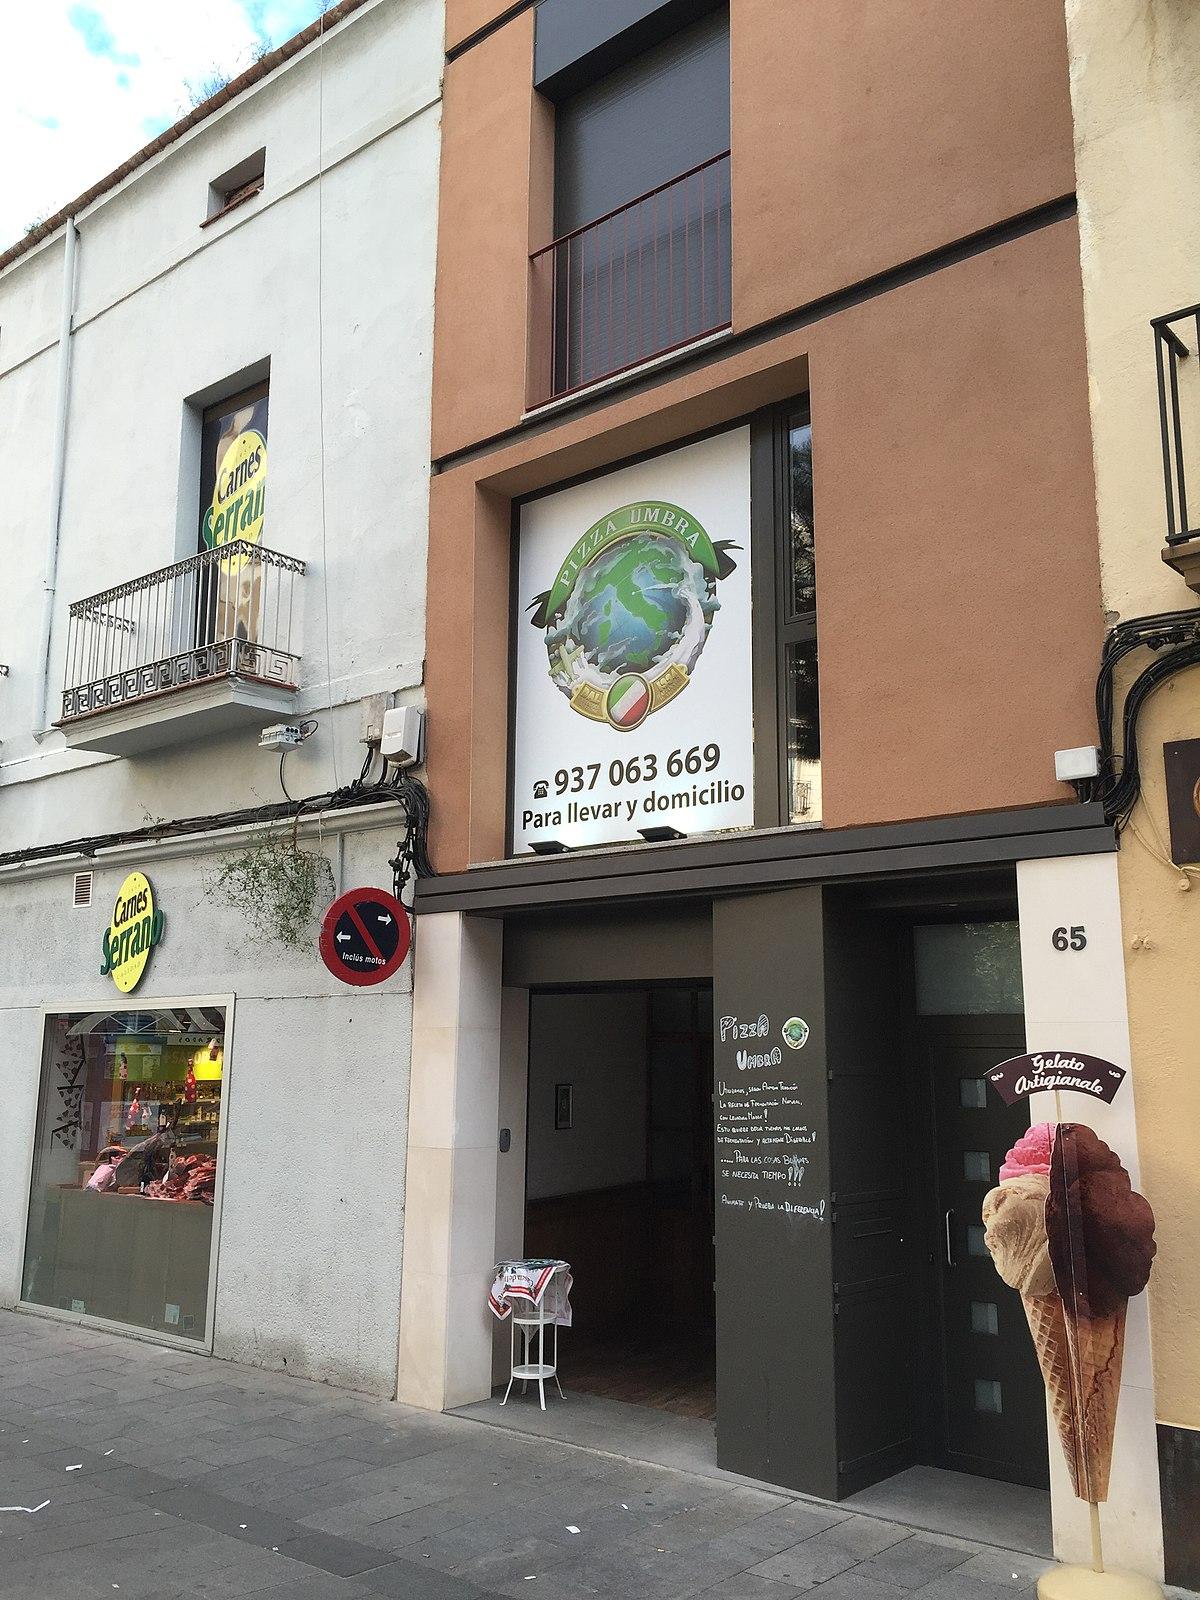 File Pizza Umbro Shop Sabadell Jpg Wikimedia Commons